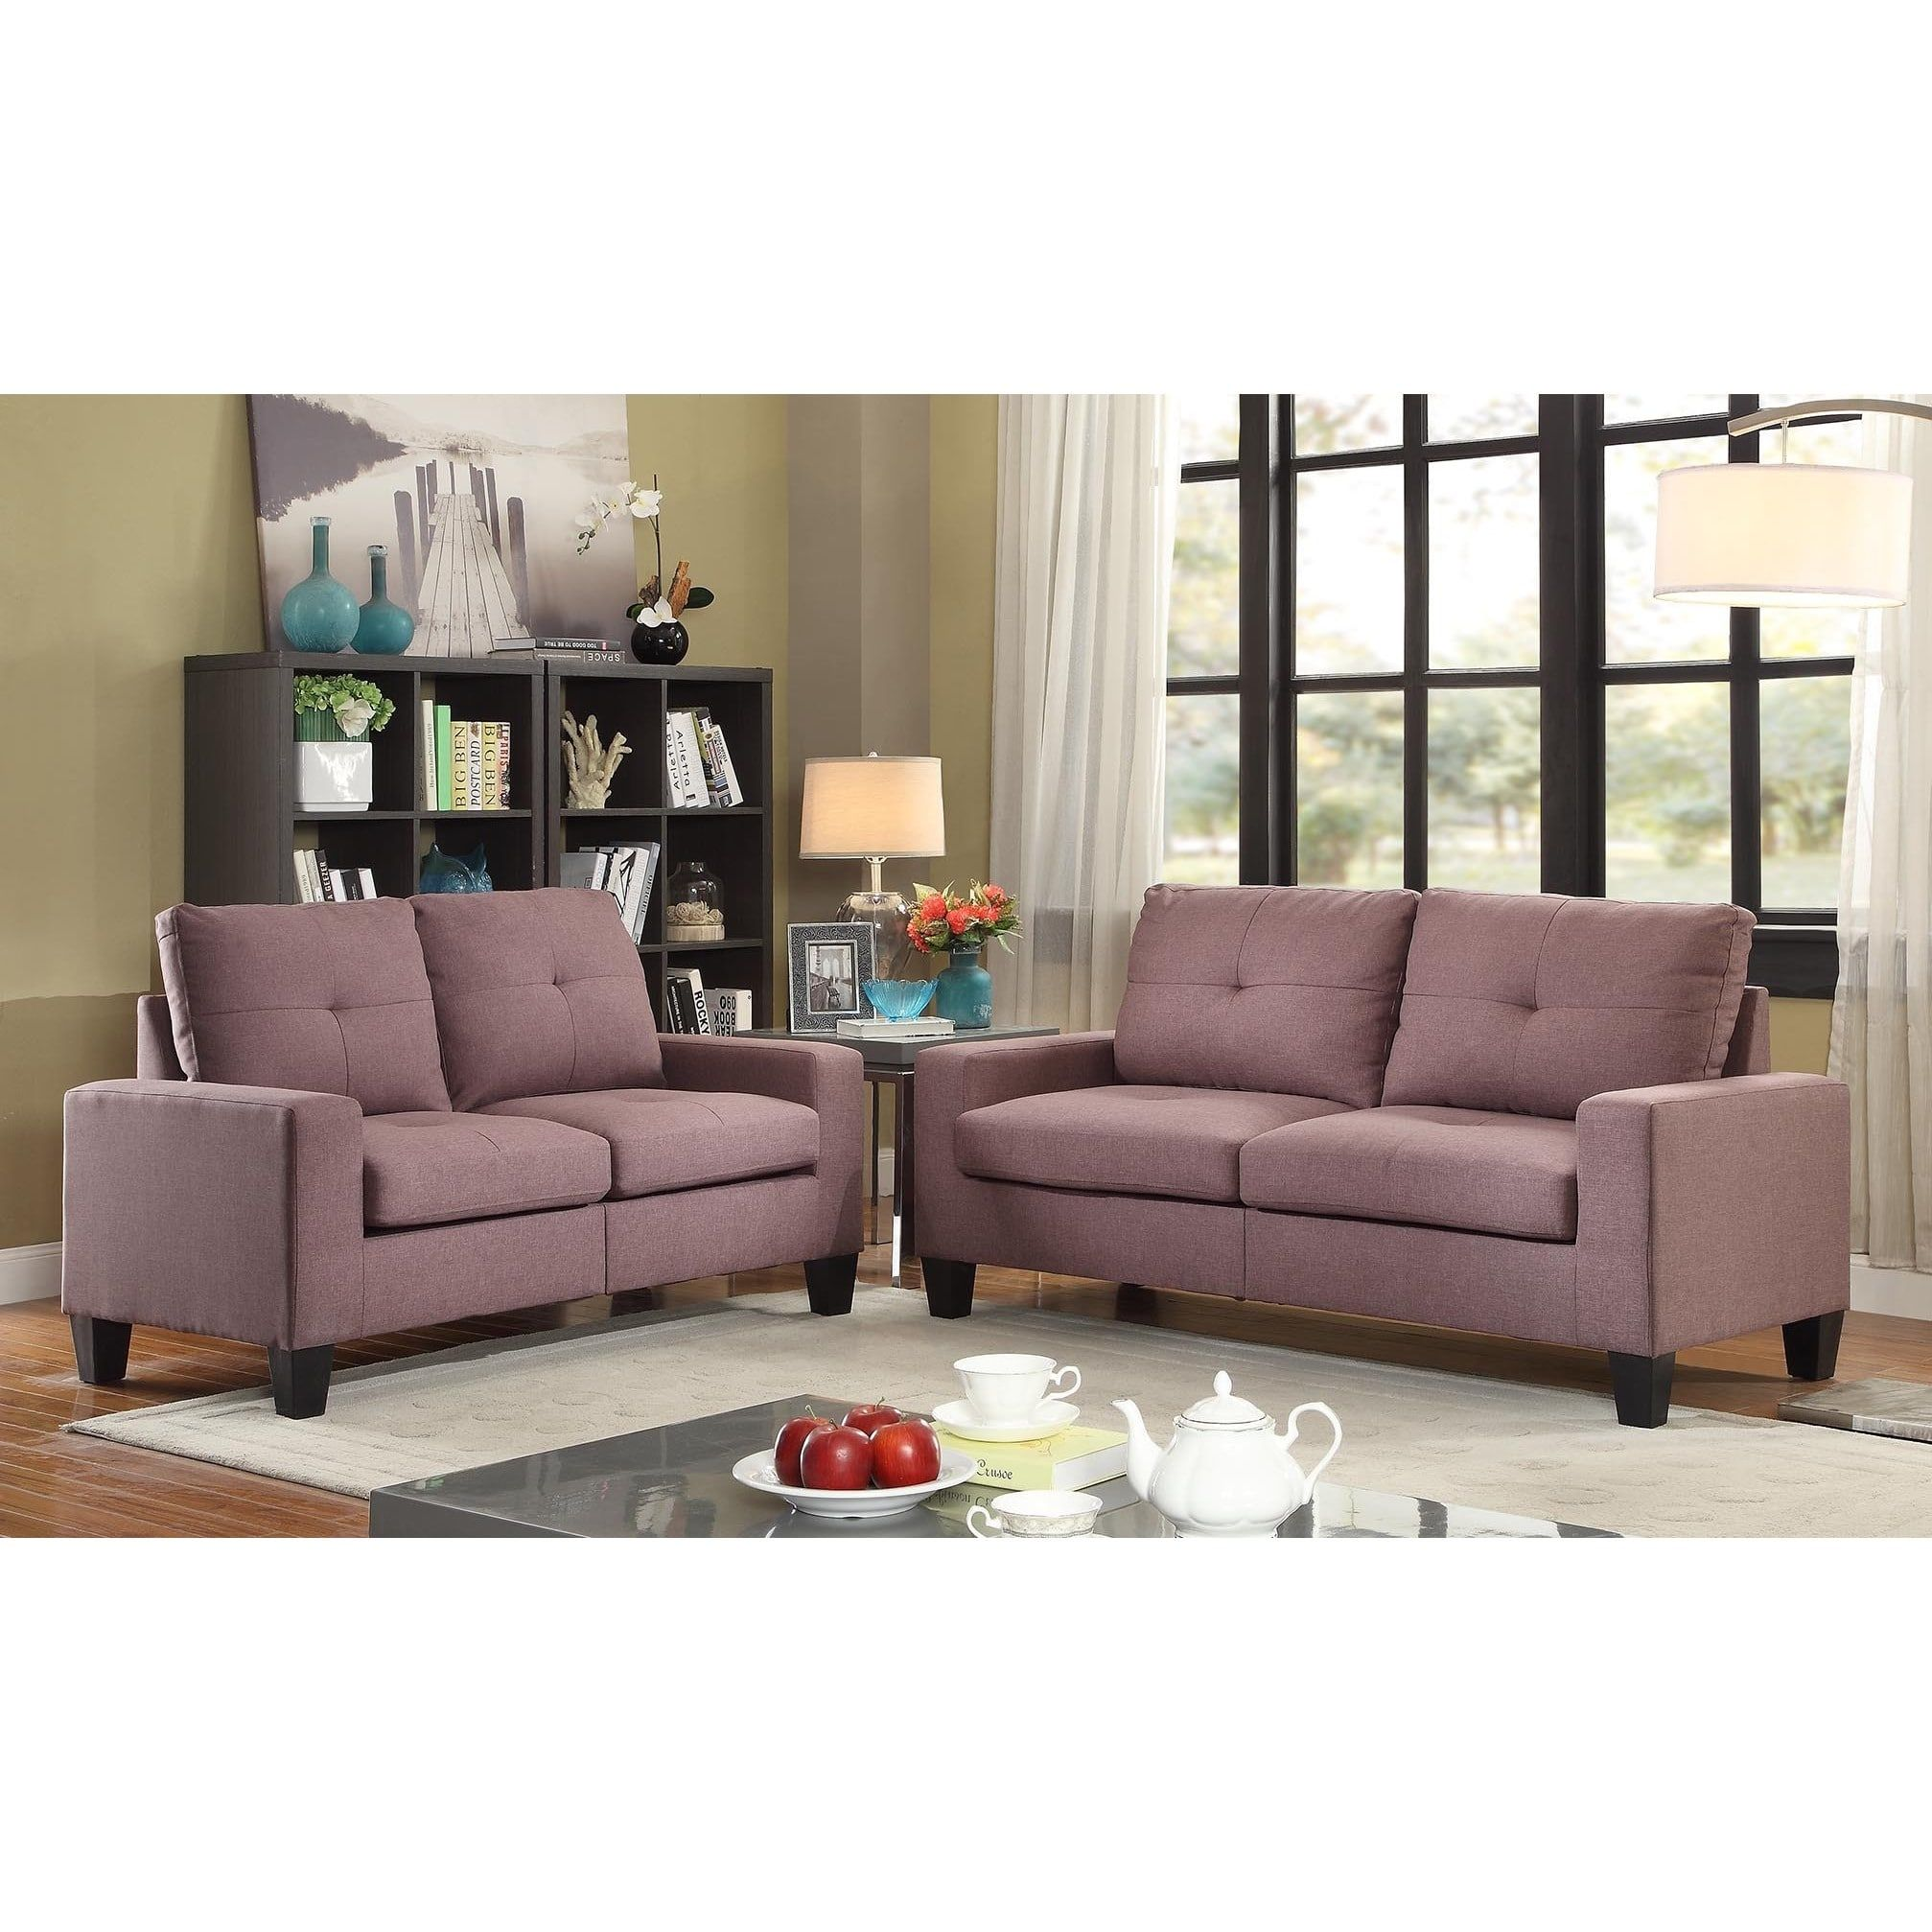 Superb Overstock Living Room Sets Part - 12: Acme Furniture Platinum II Sofa And Loveseat Living Room Set | Overstock.com  Shopping -